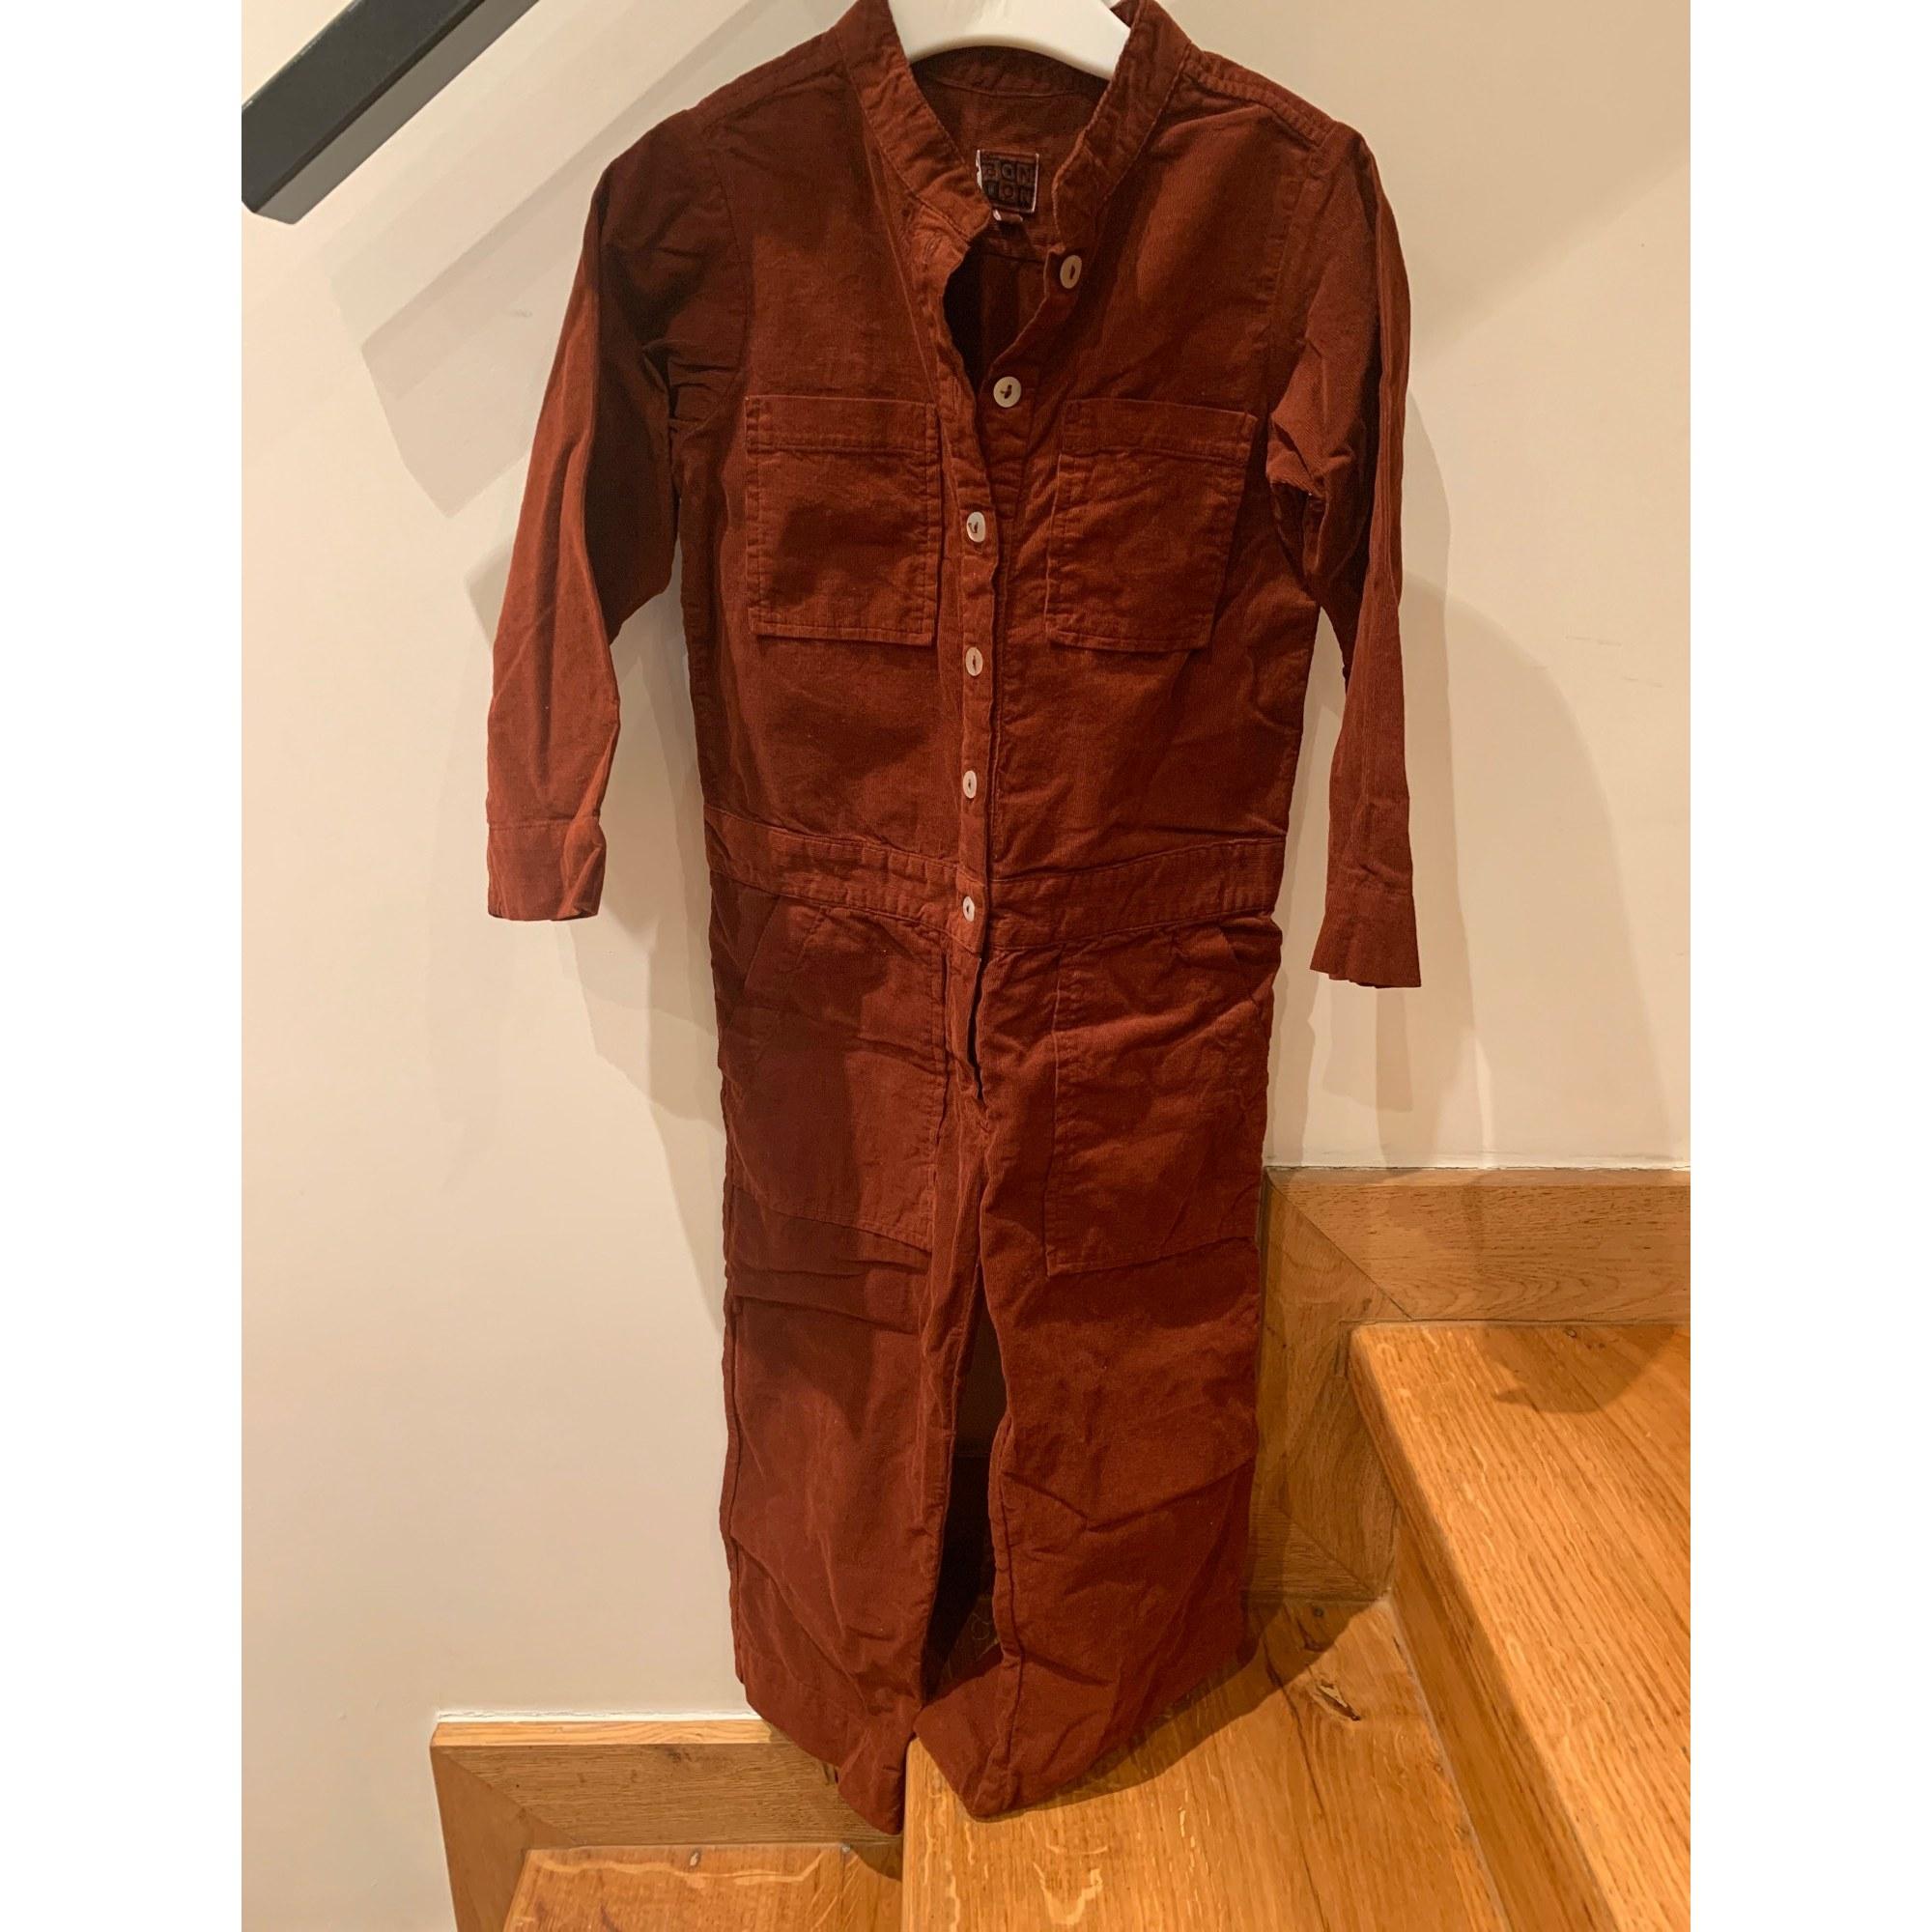 Pants Set, Outfit BONTON Red, burgundy